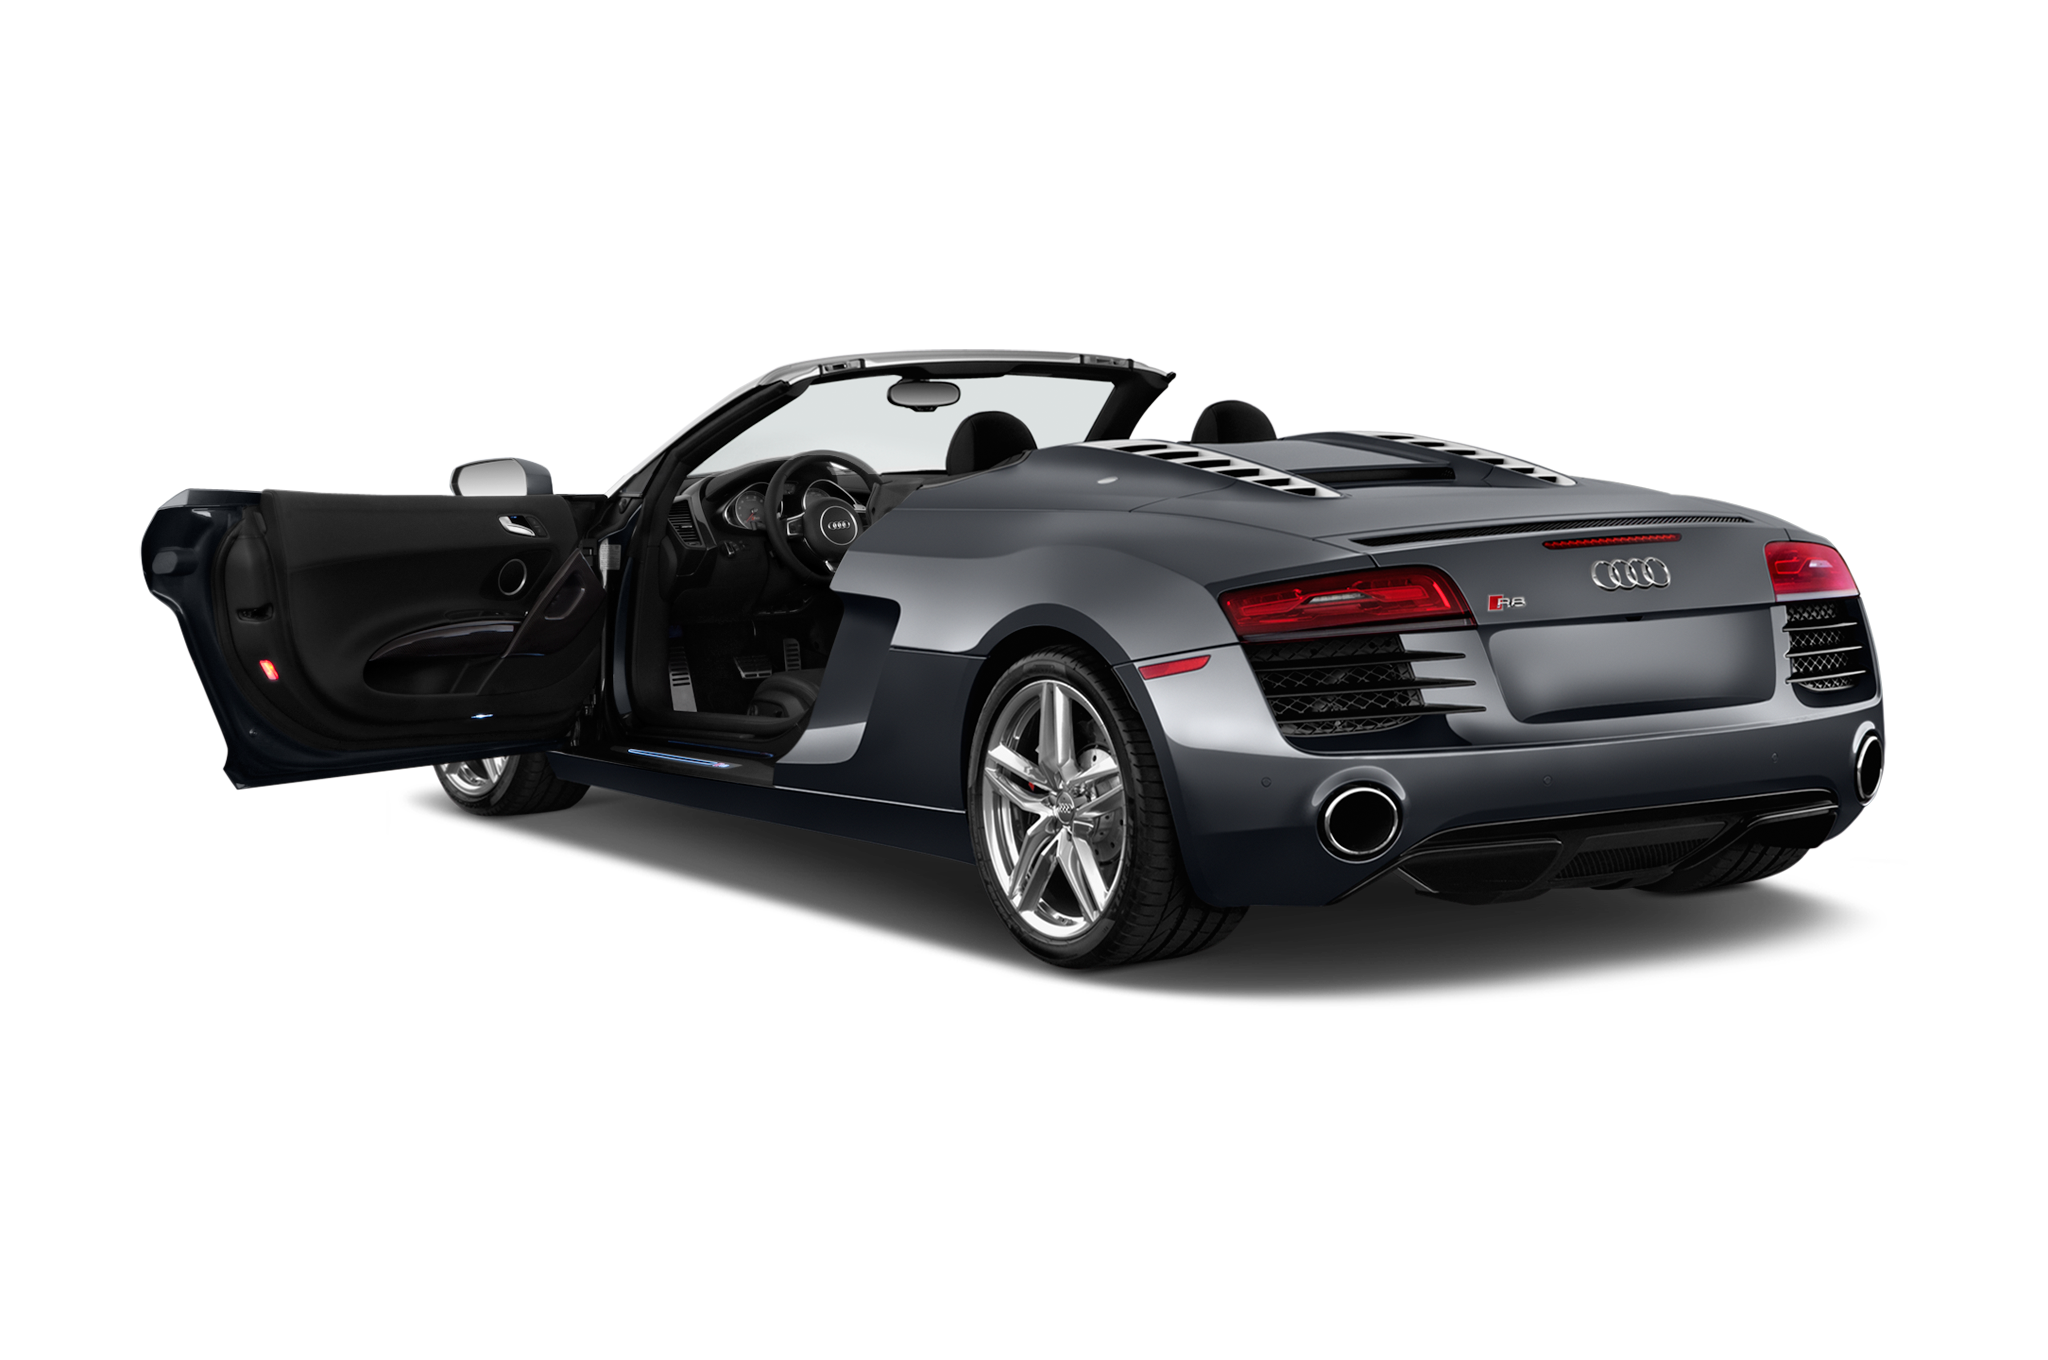 2015 Audi R8 Compeion Heads to L.A. Auto Show